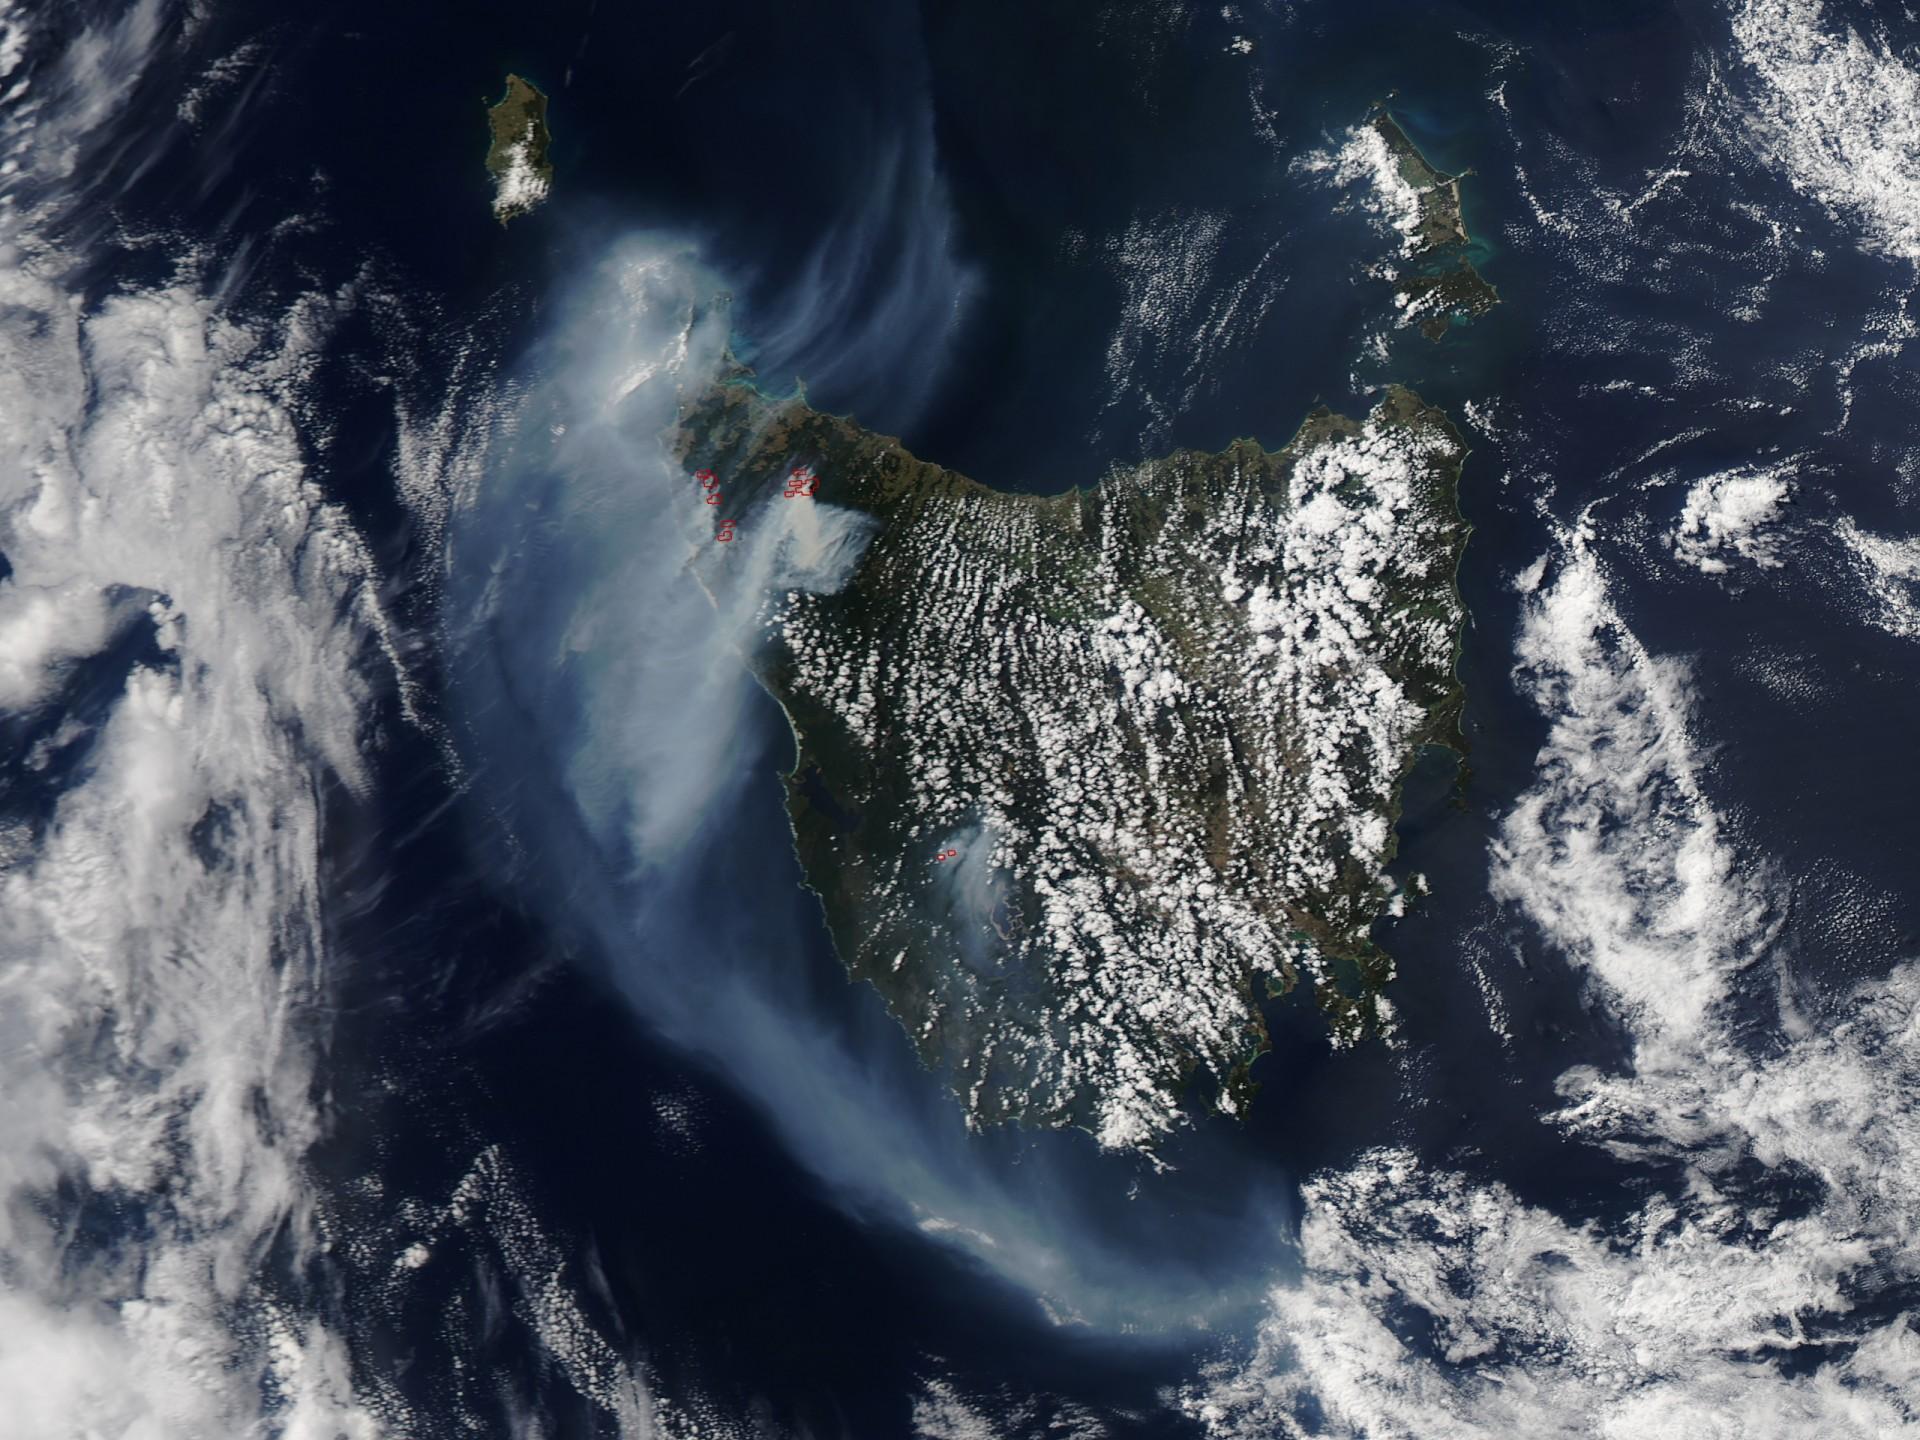 Tasmania fires. NASA image by Jeff Schmaltz